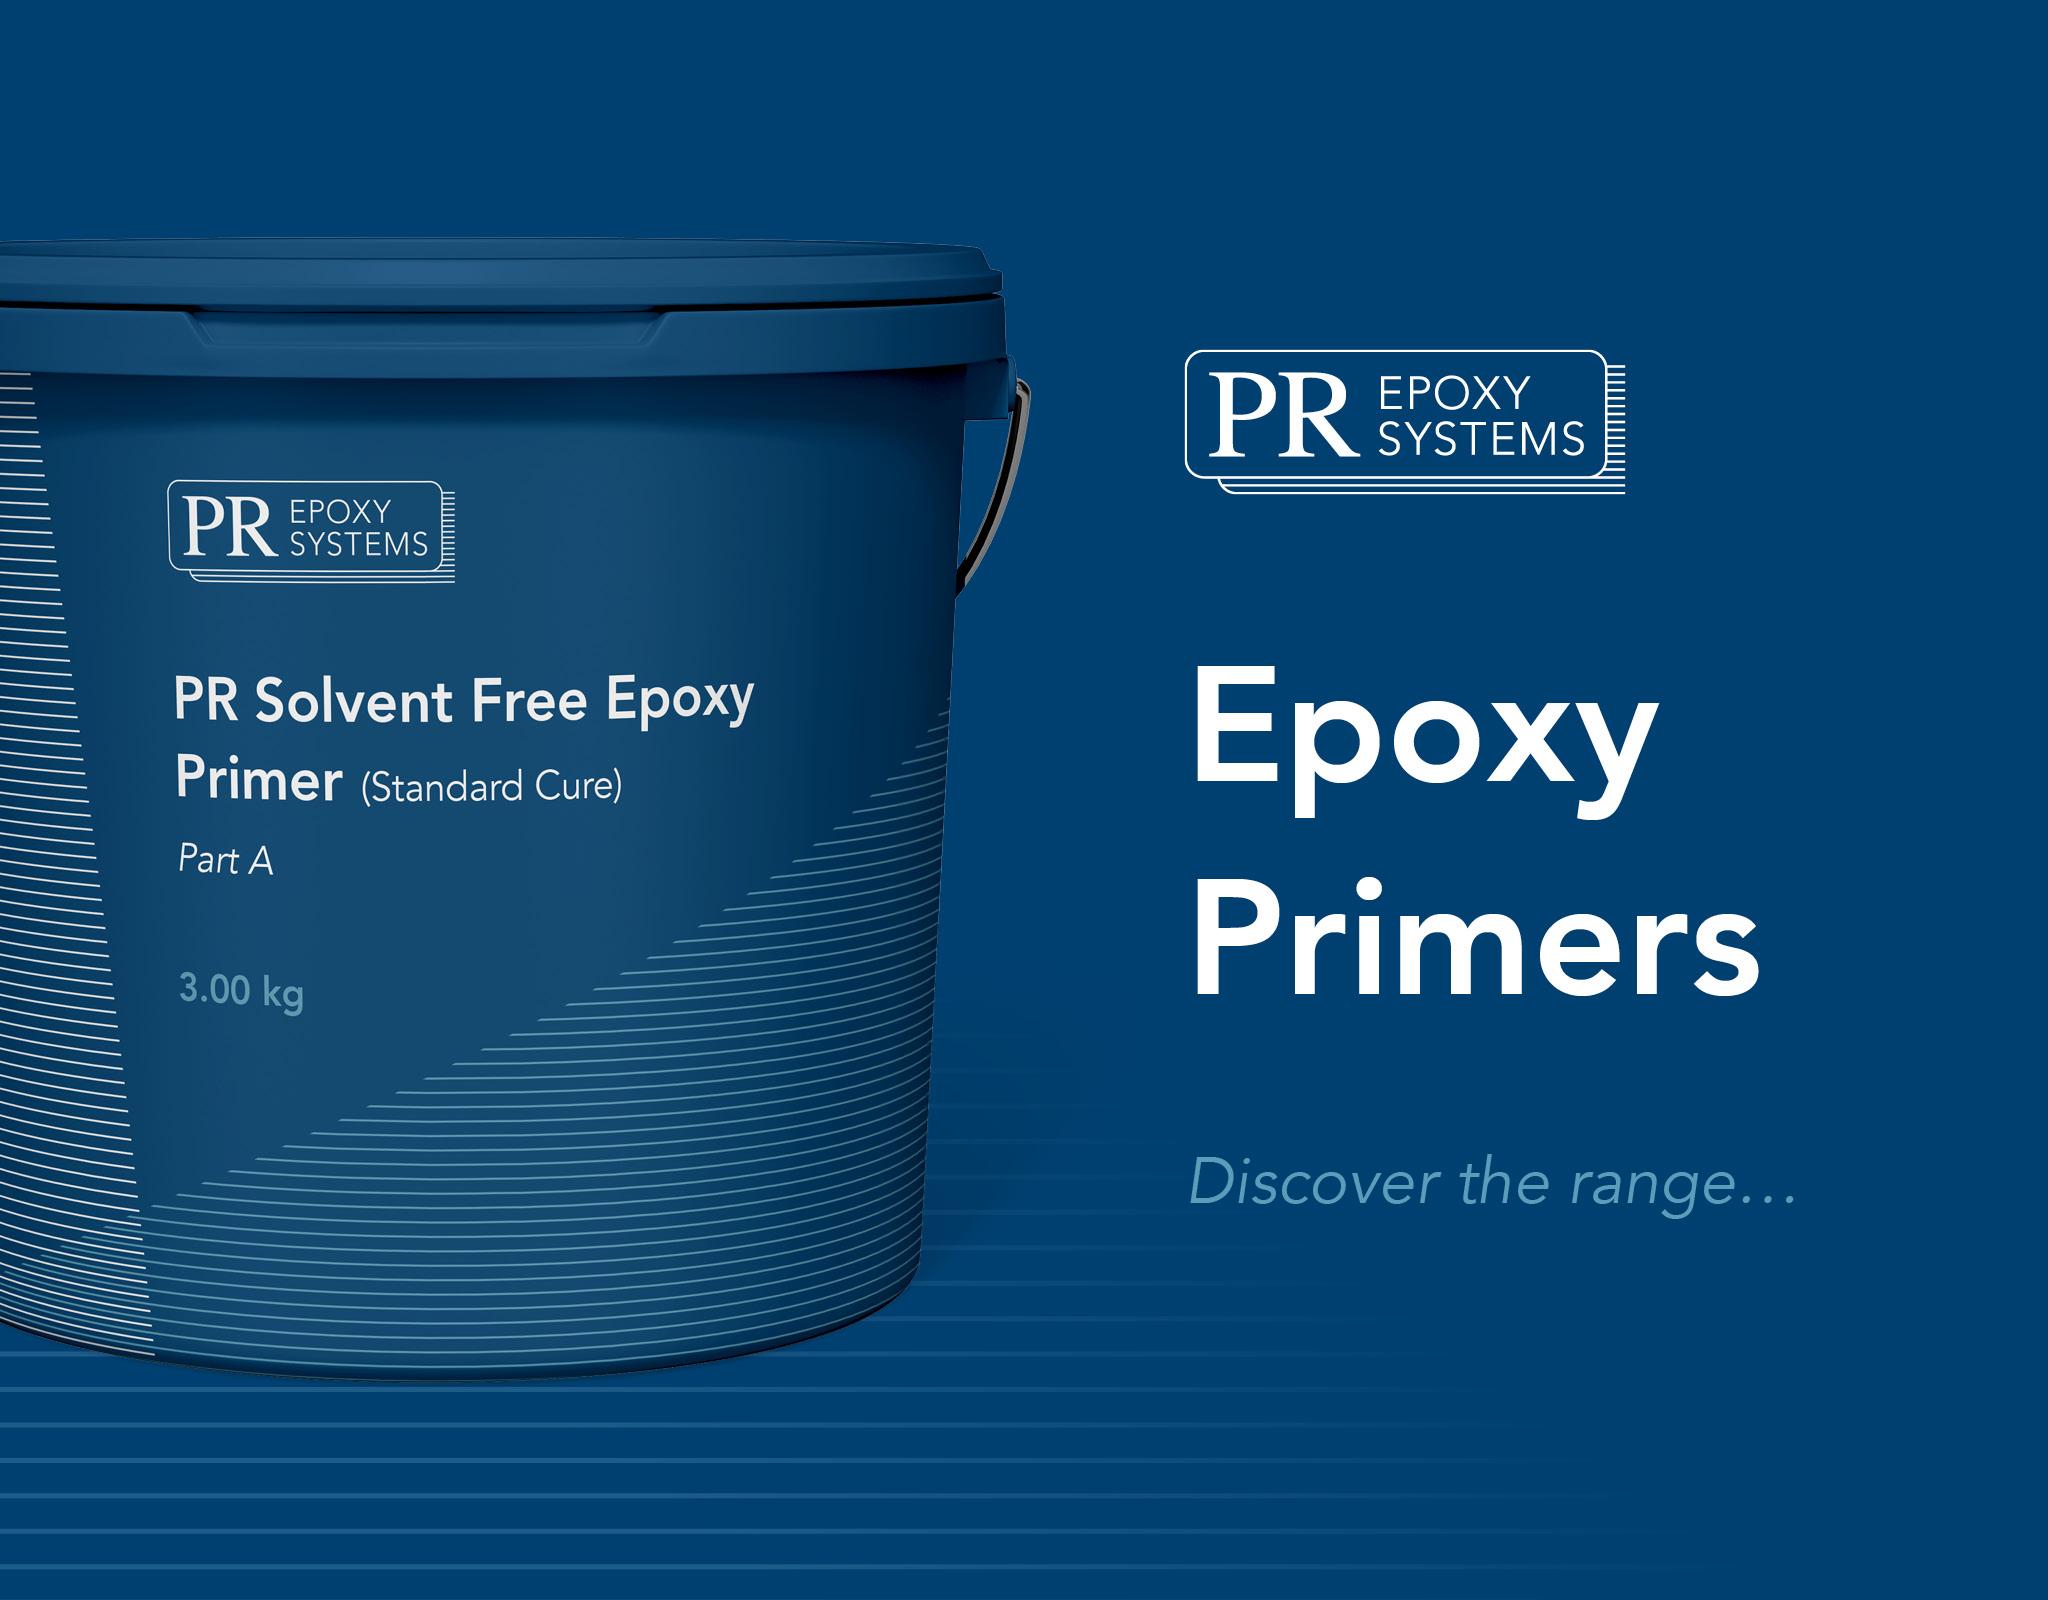 PR Epoxy Primers - Discover the Range